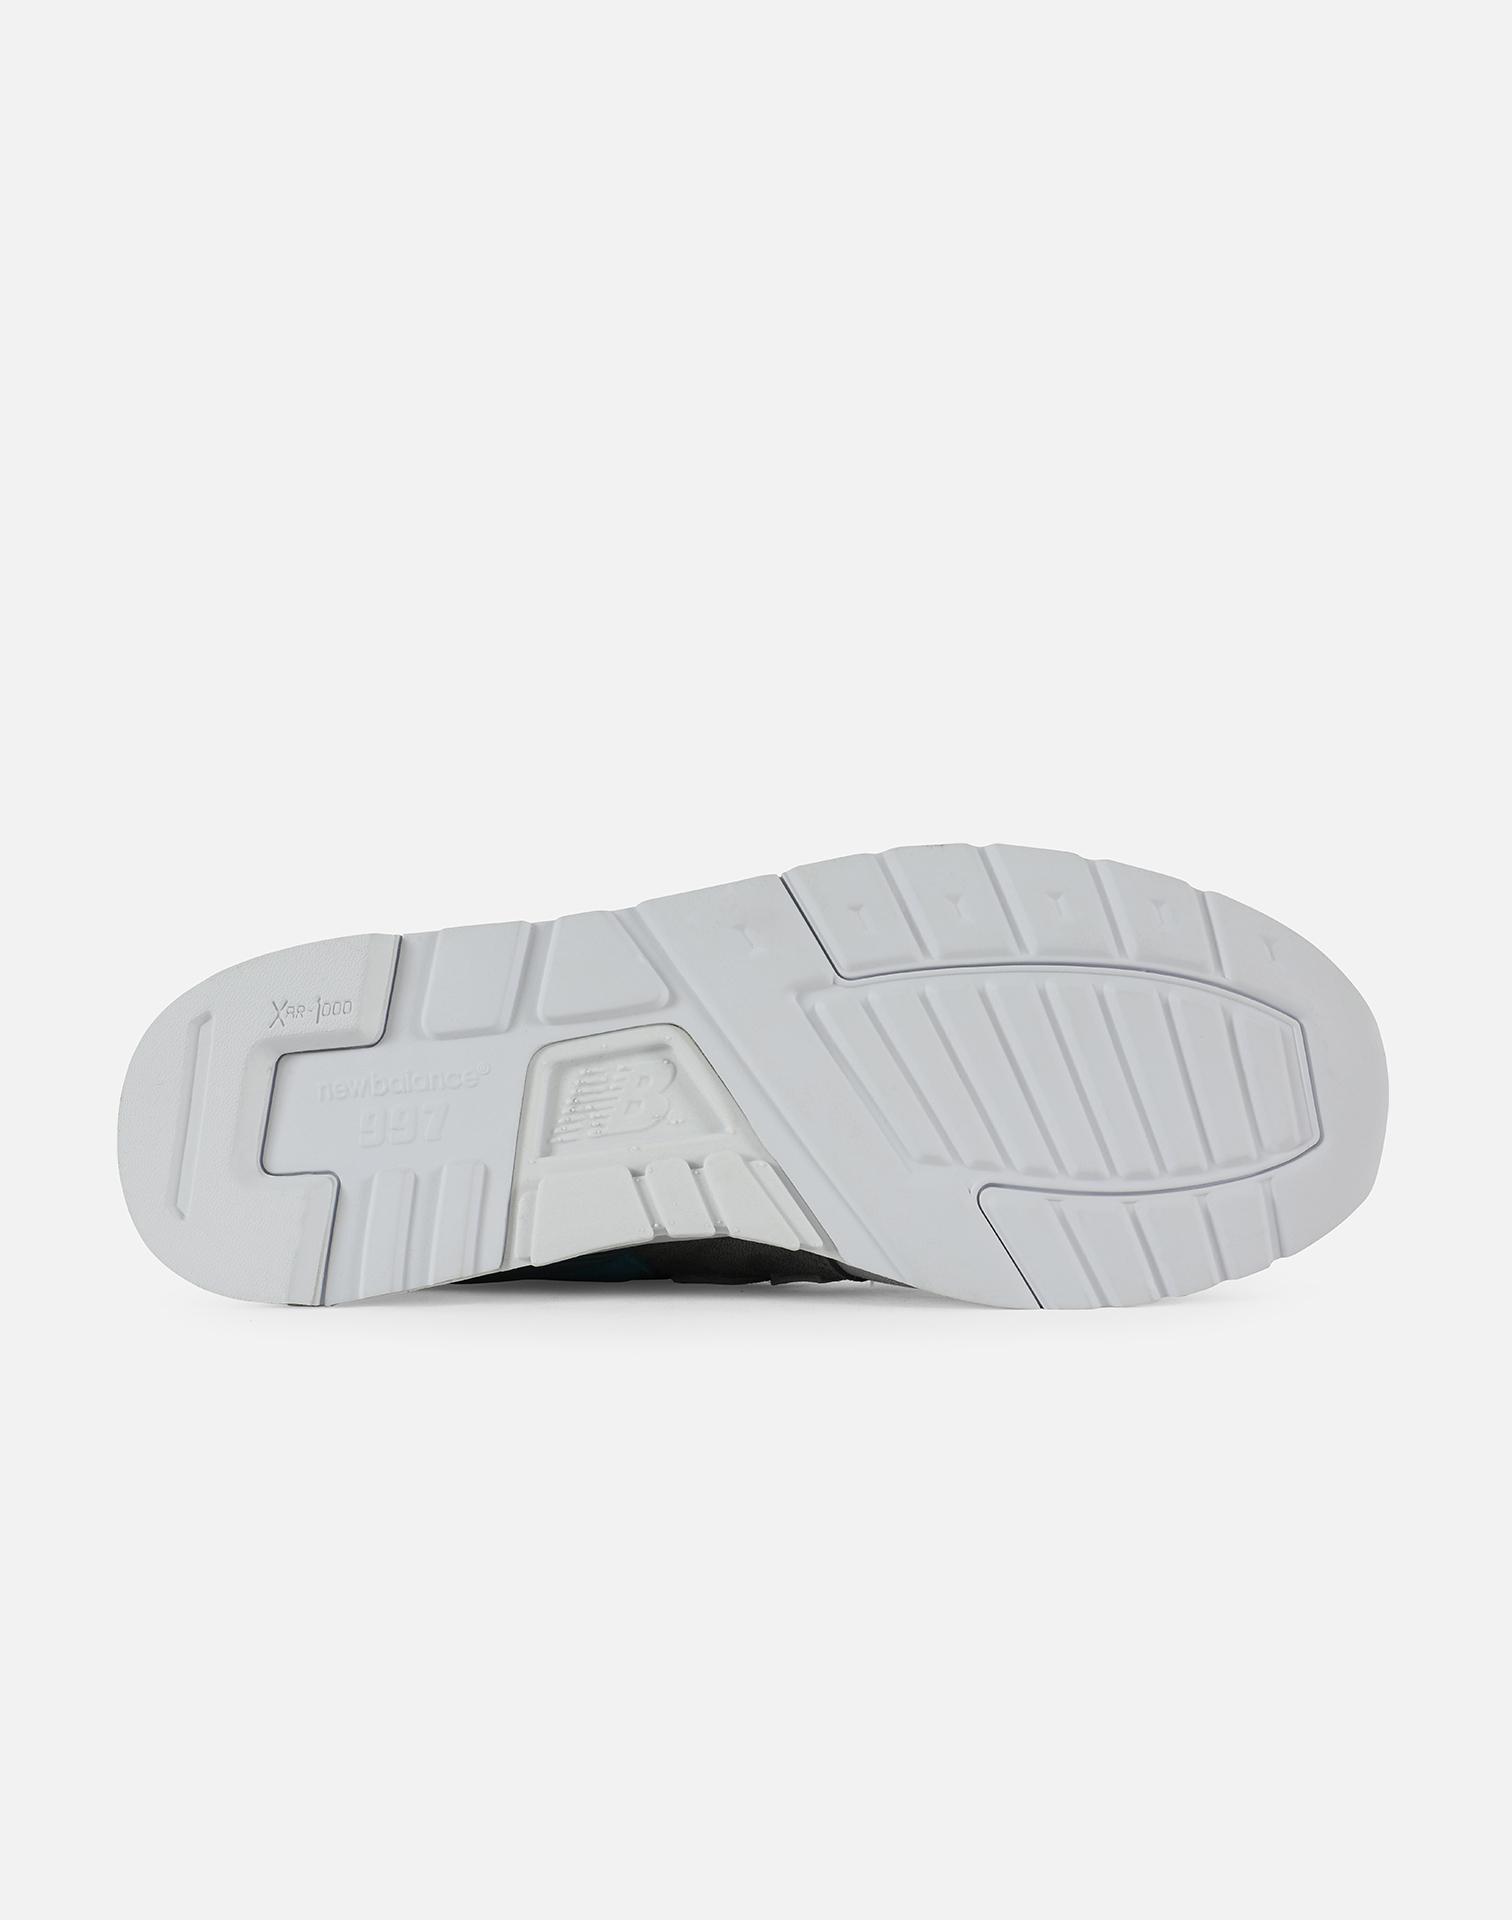 40fdd41a95e Lyst - New Balance 997 in Gray for Men